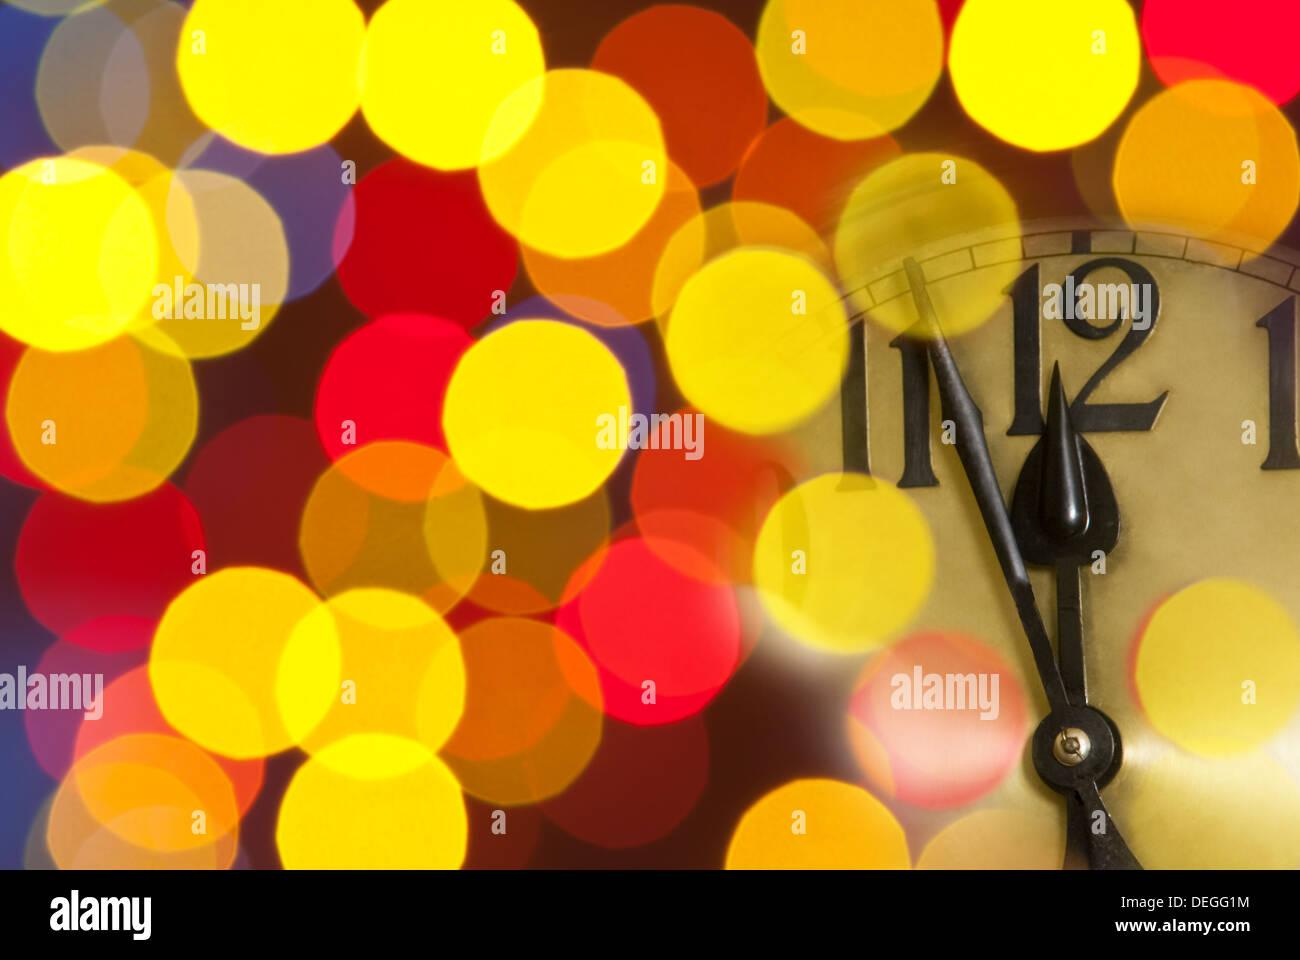 New Year clock - Stock Image